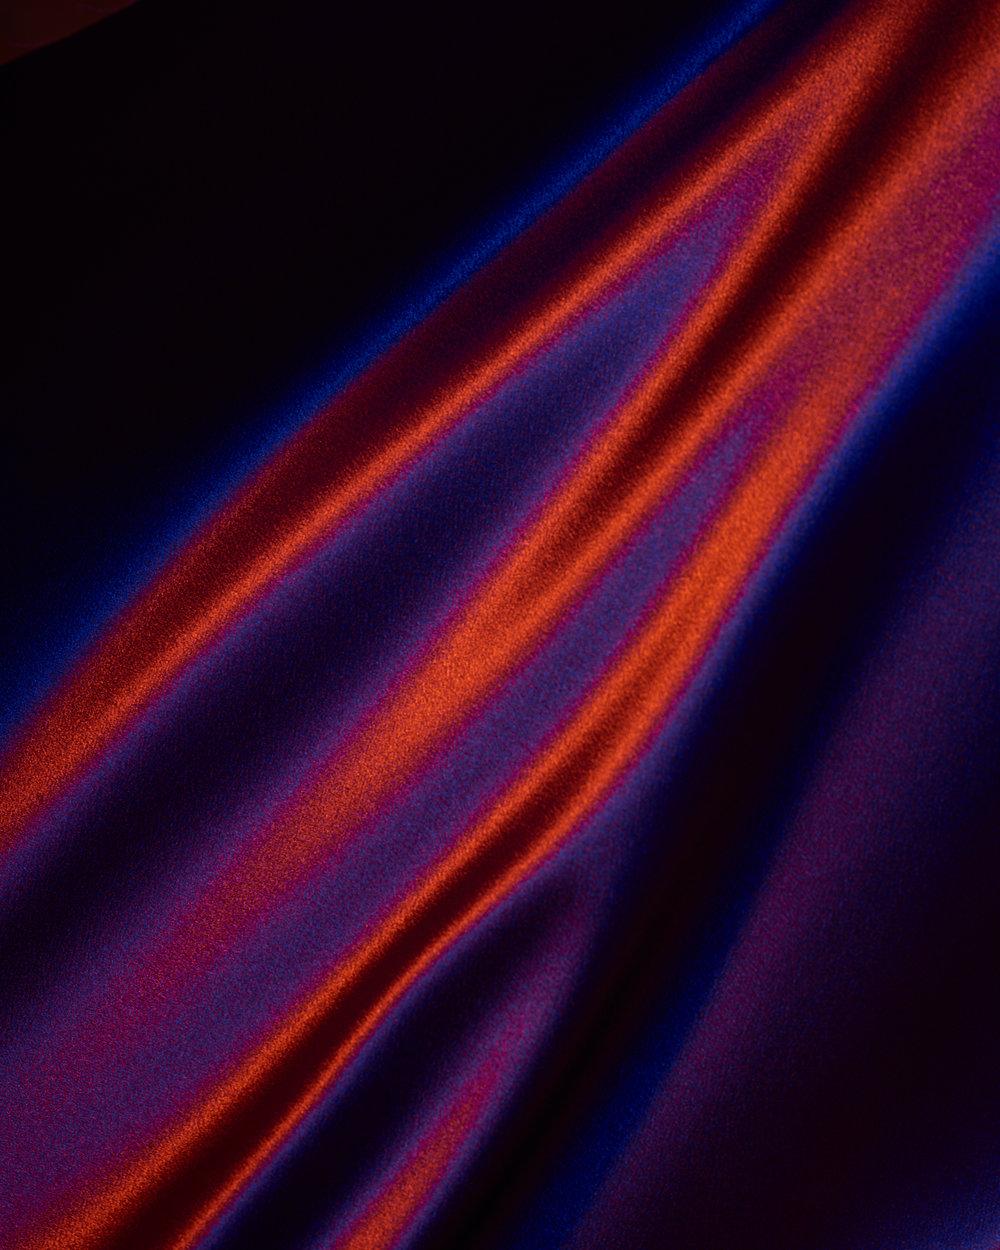 ColouredFabric22.jpg